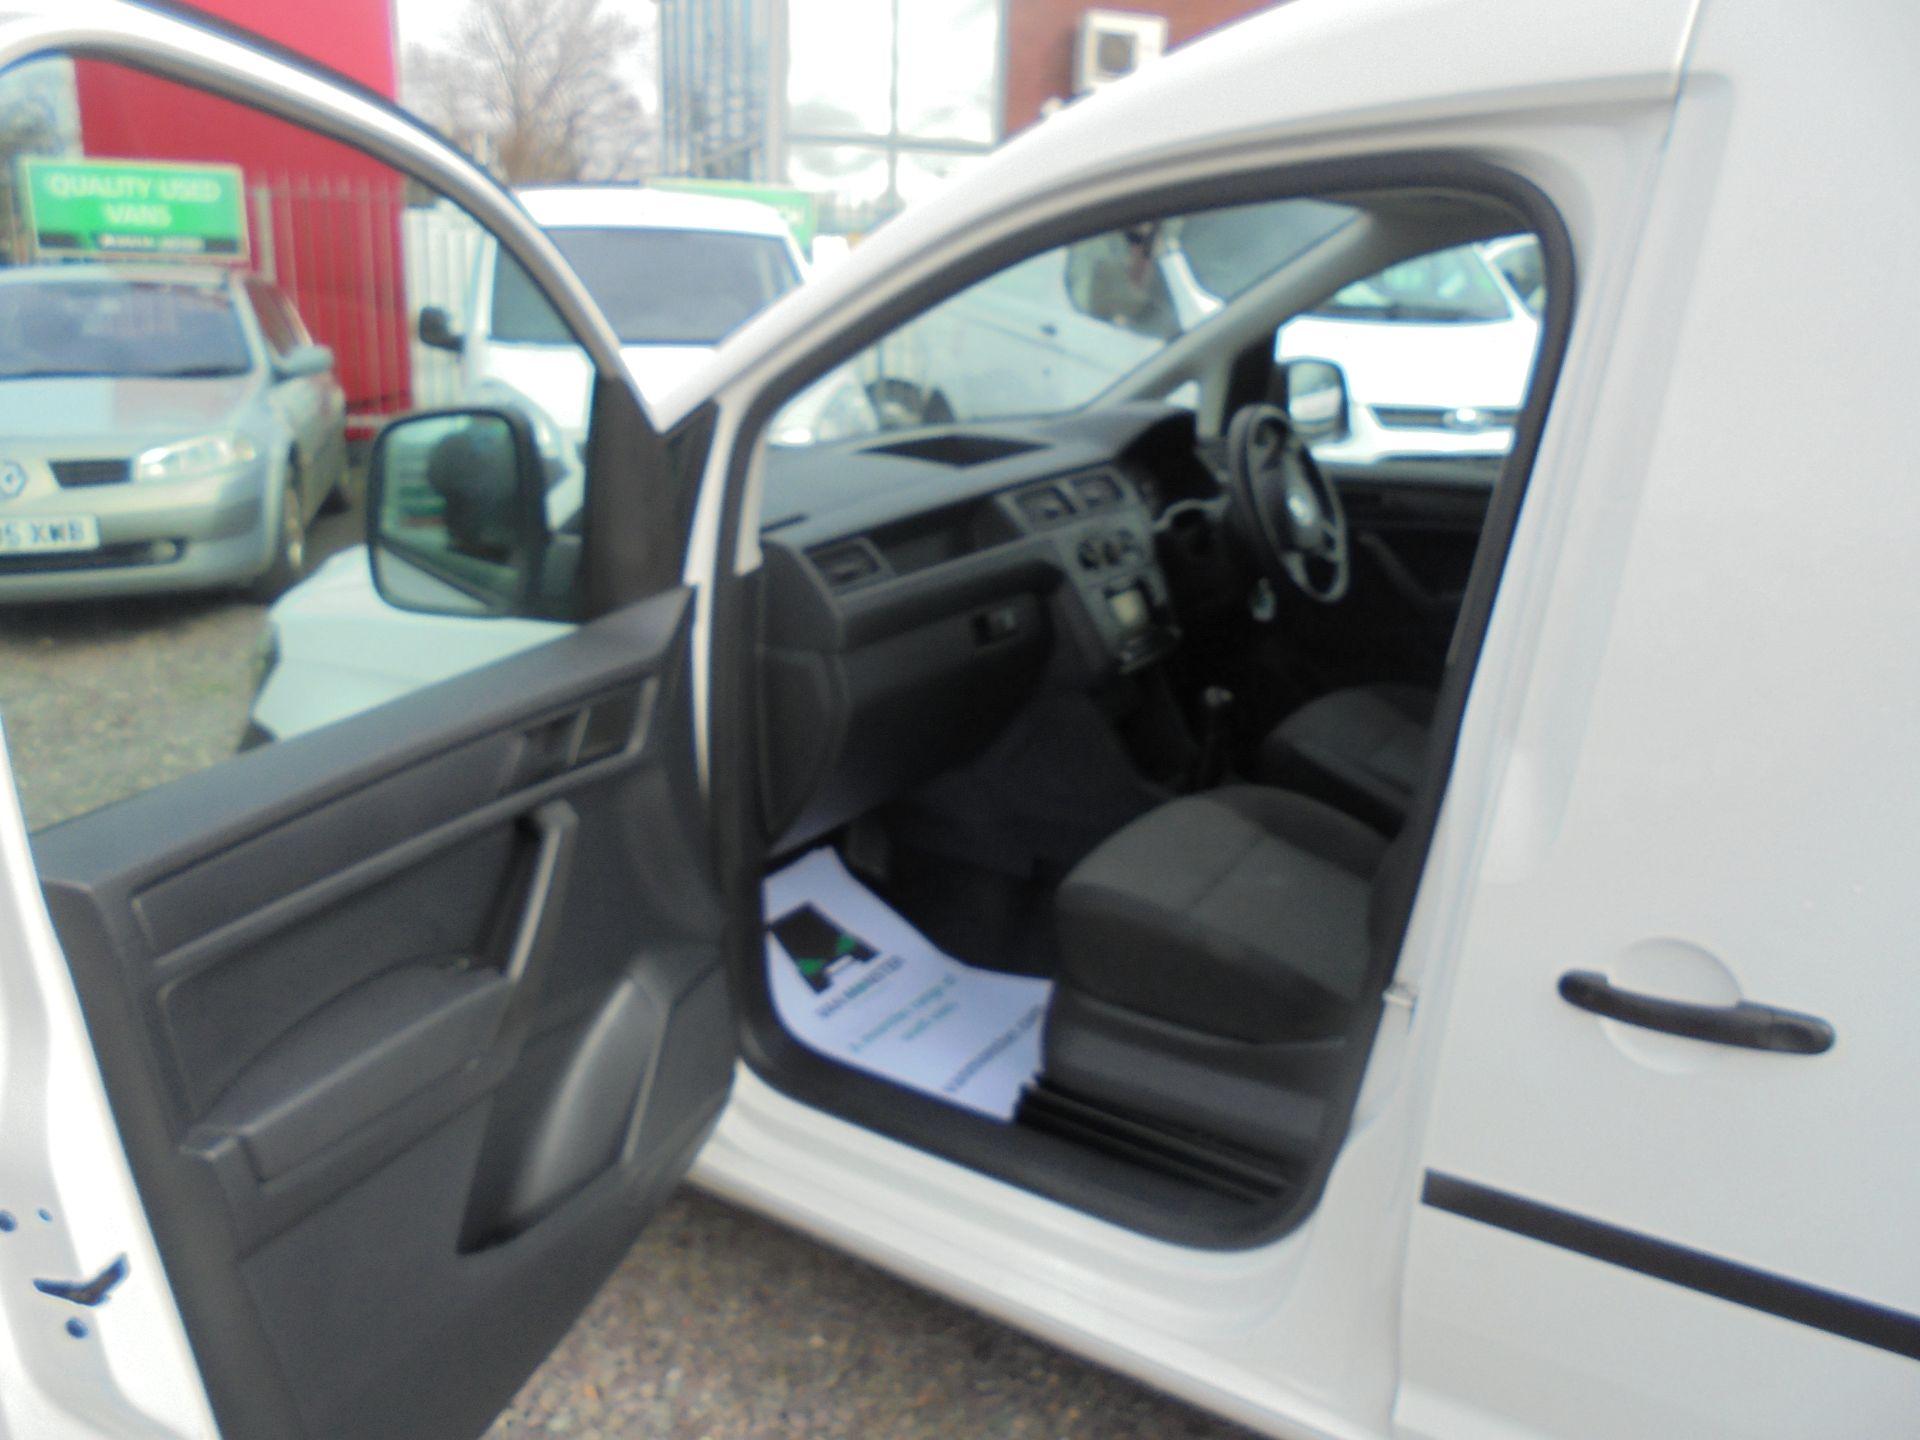 2016 Volkswagen Caddy 1.6 TDI BLUEMOTION TECH 75PS EURO 5 (GF66BZK) Image 12